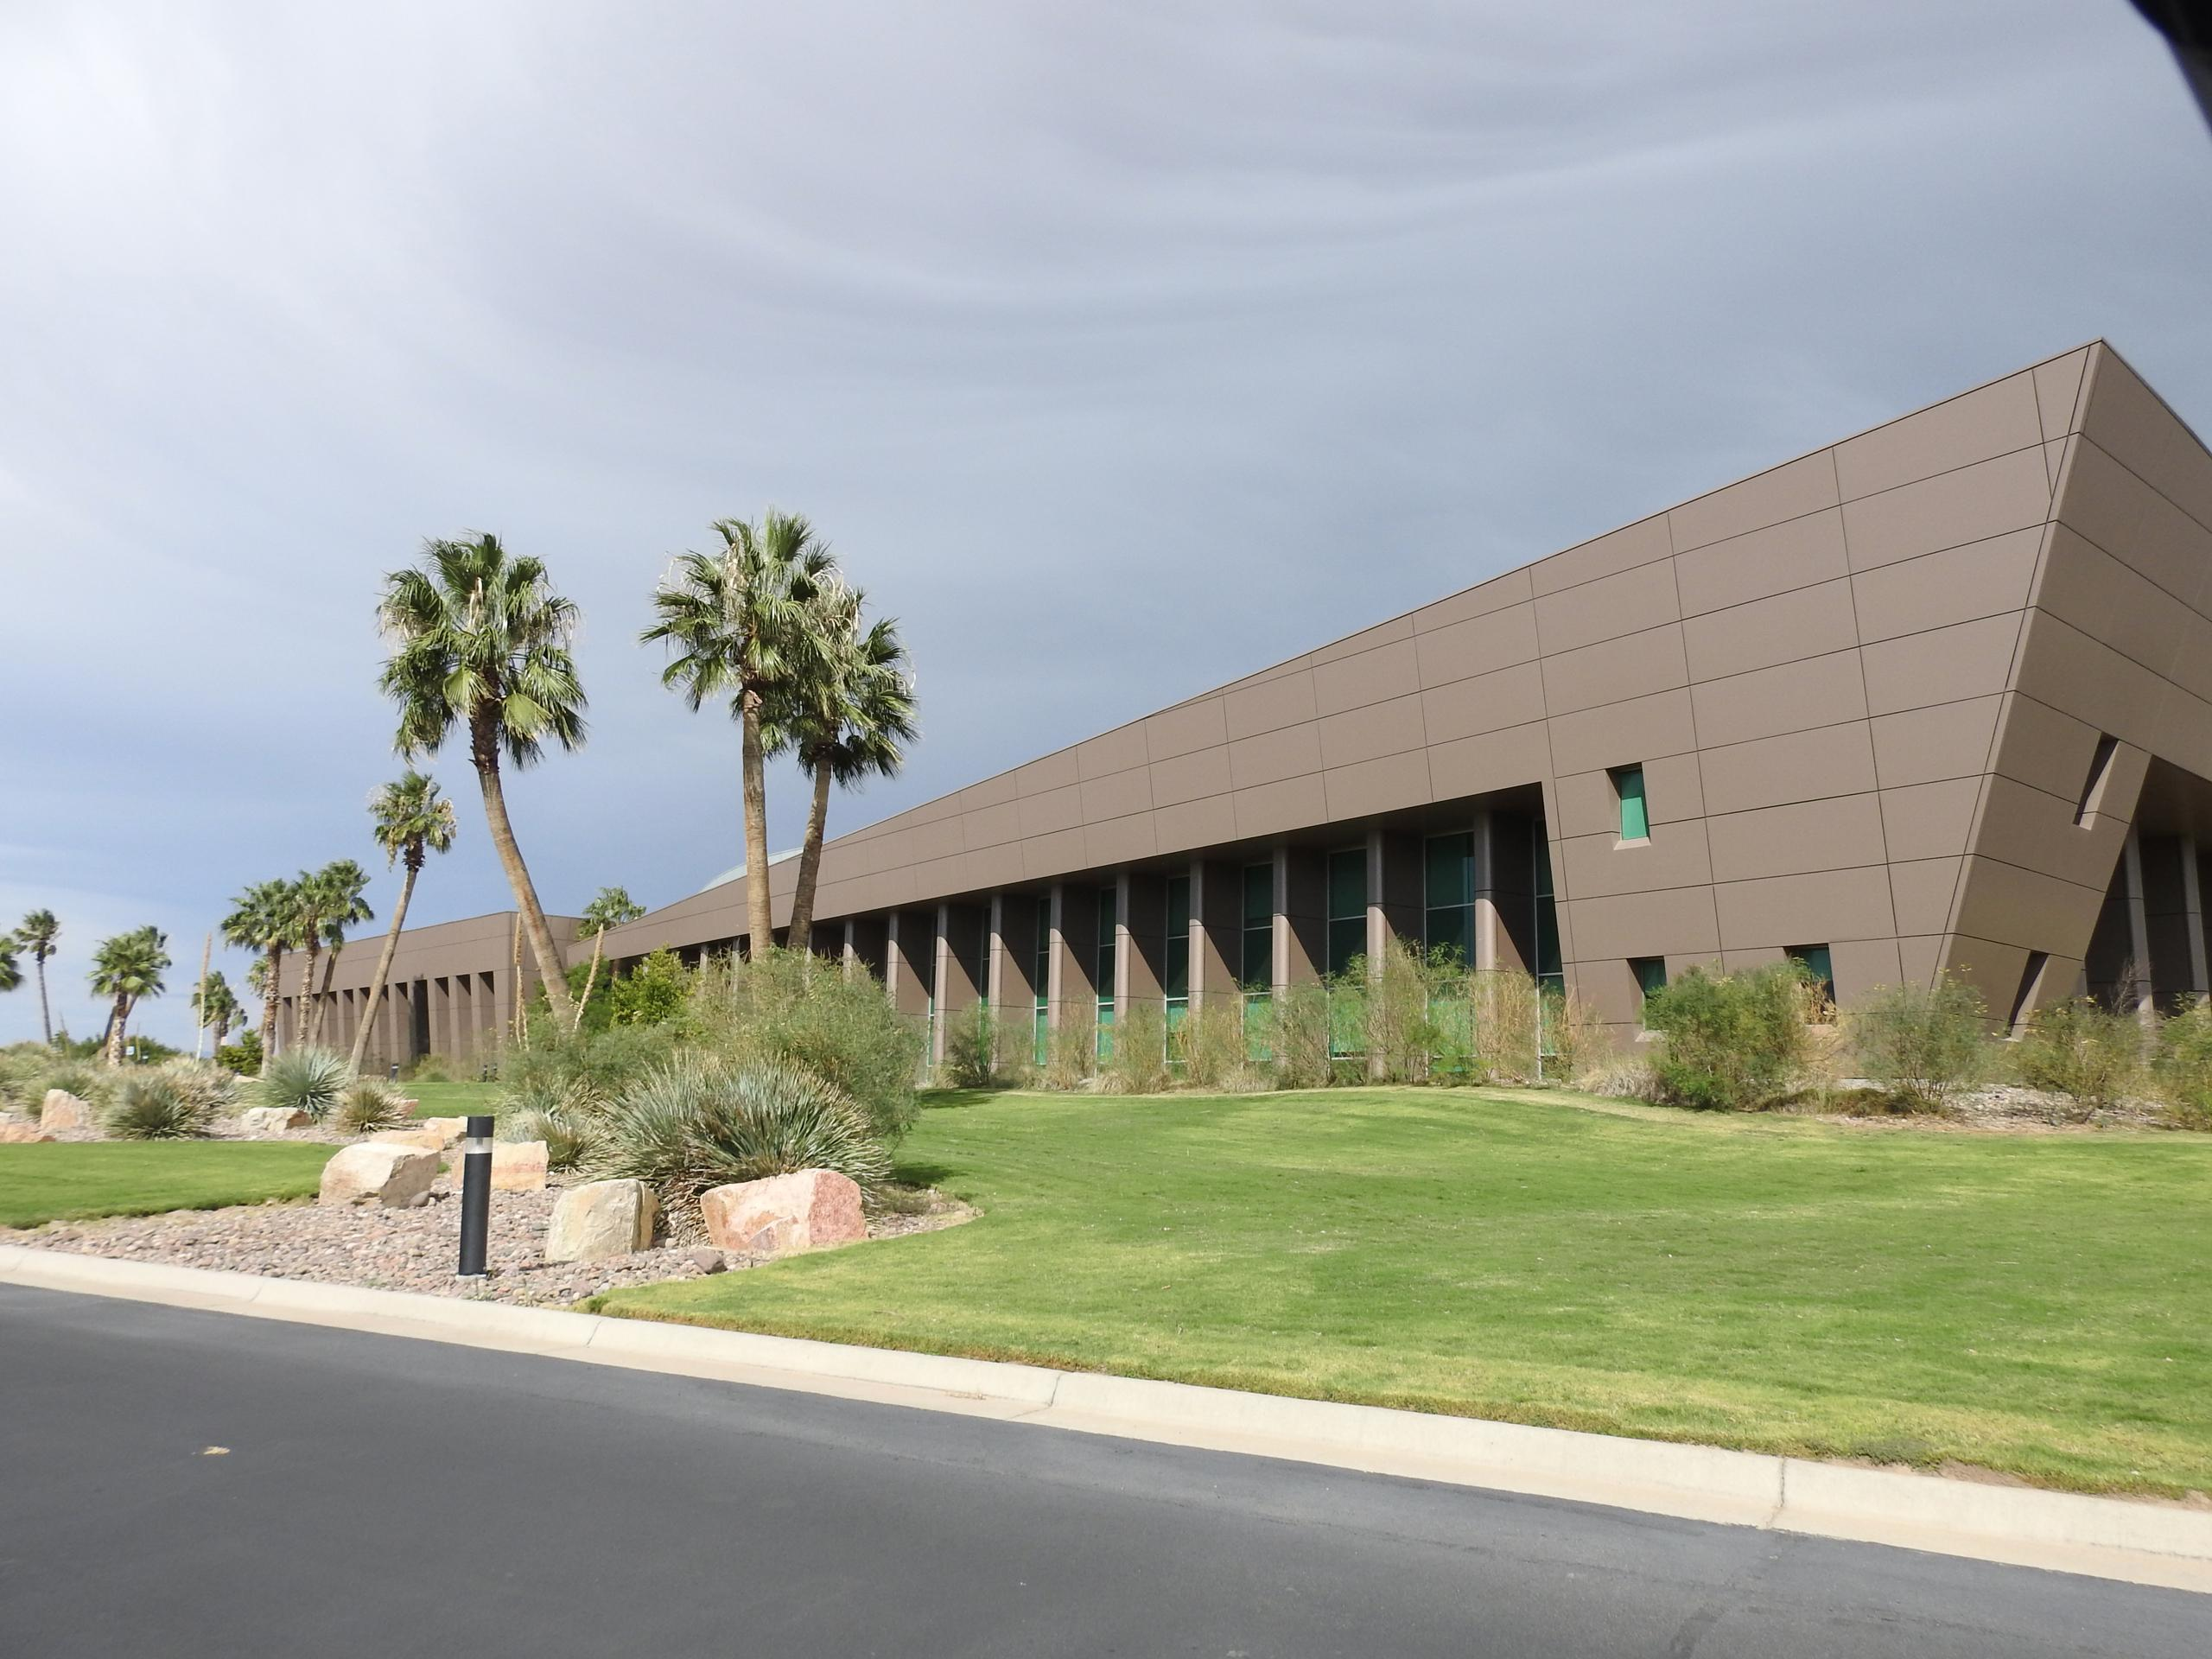 Helen of Troy's corporate headquarters in El Paso, Texas.